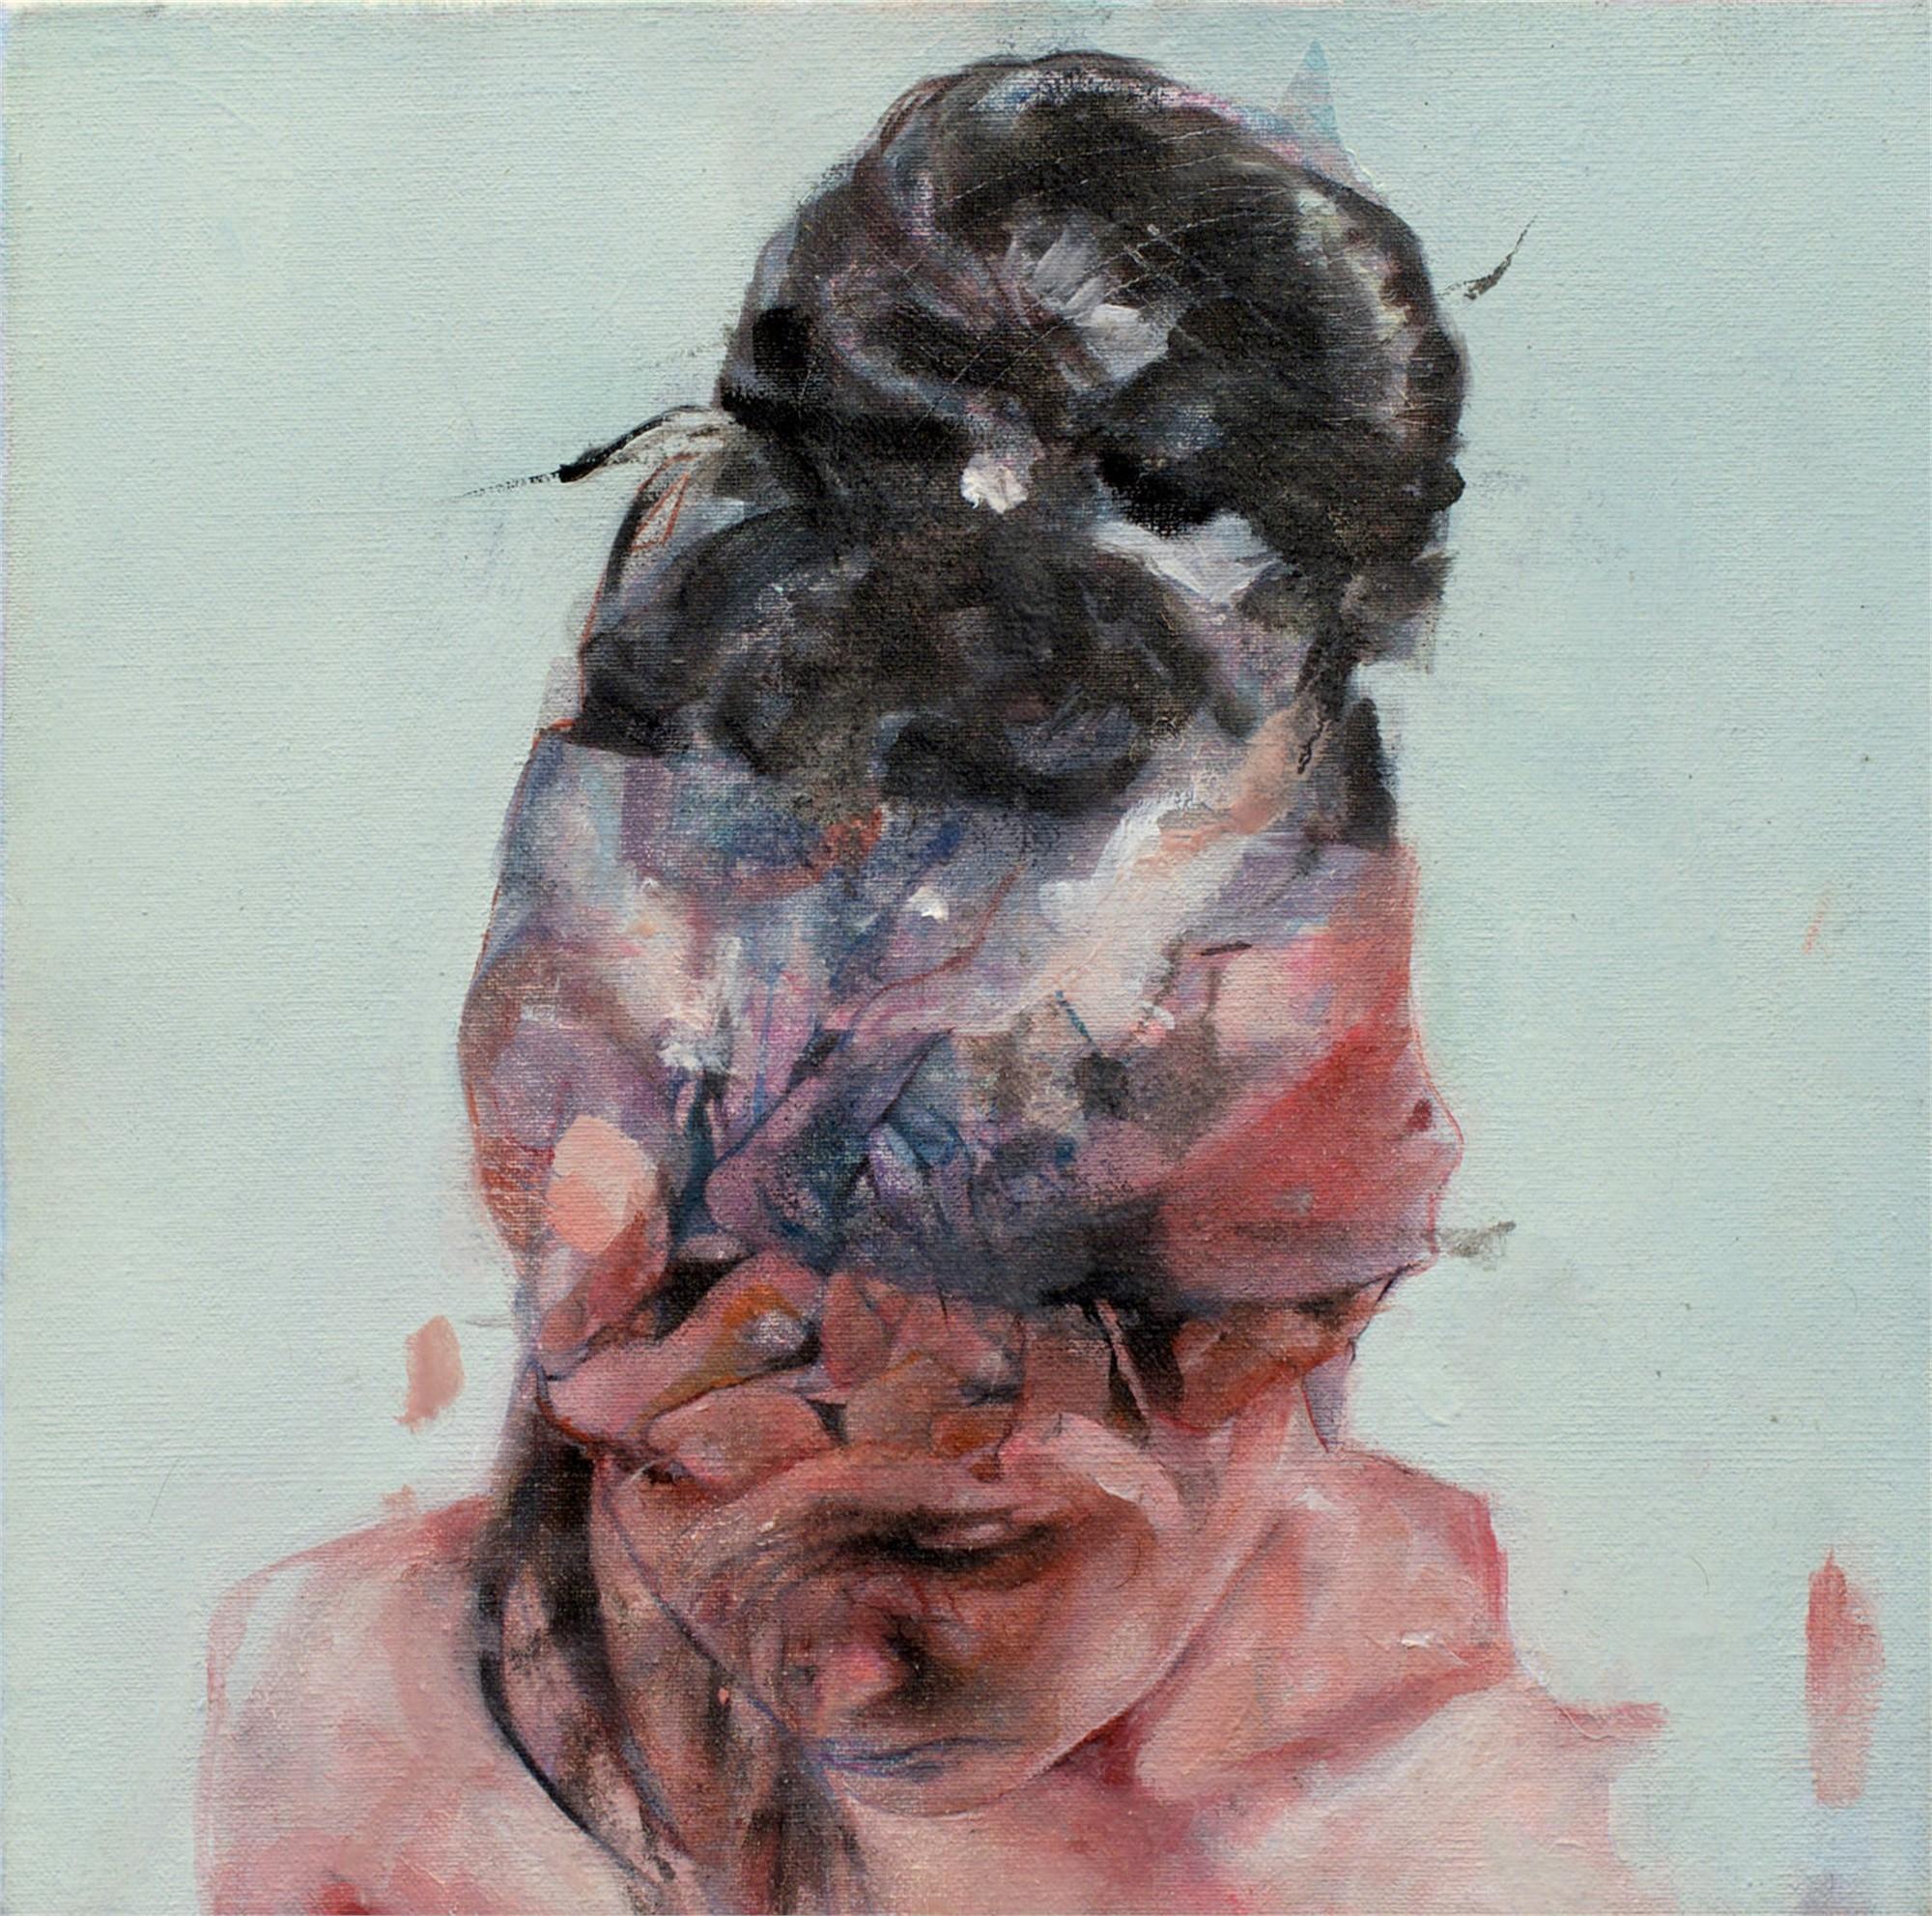 The Quiet Impact by Benjamin Garcia